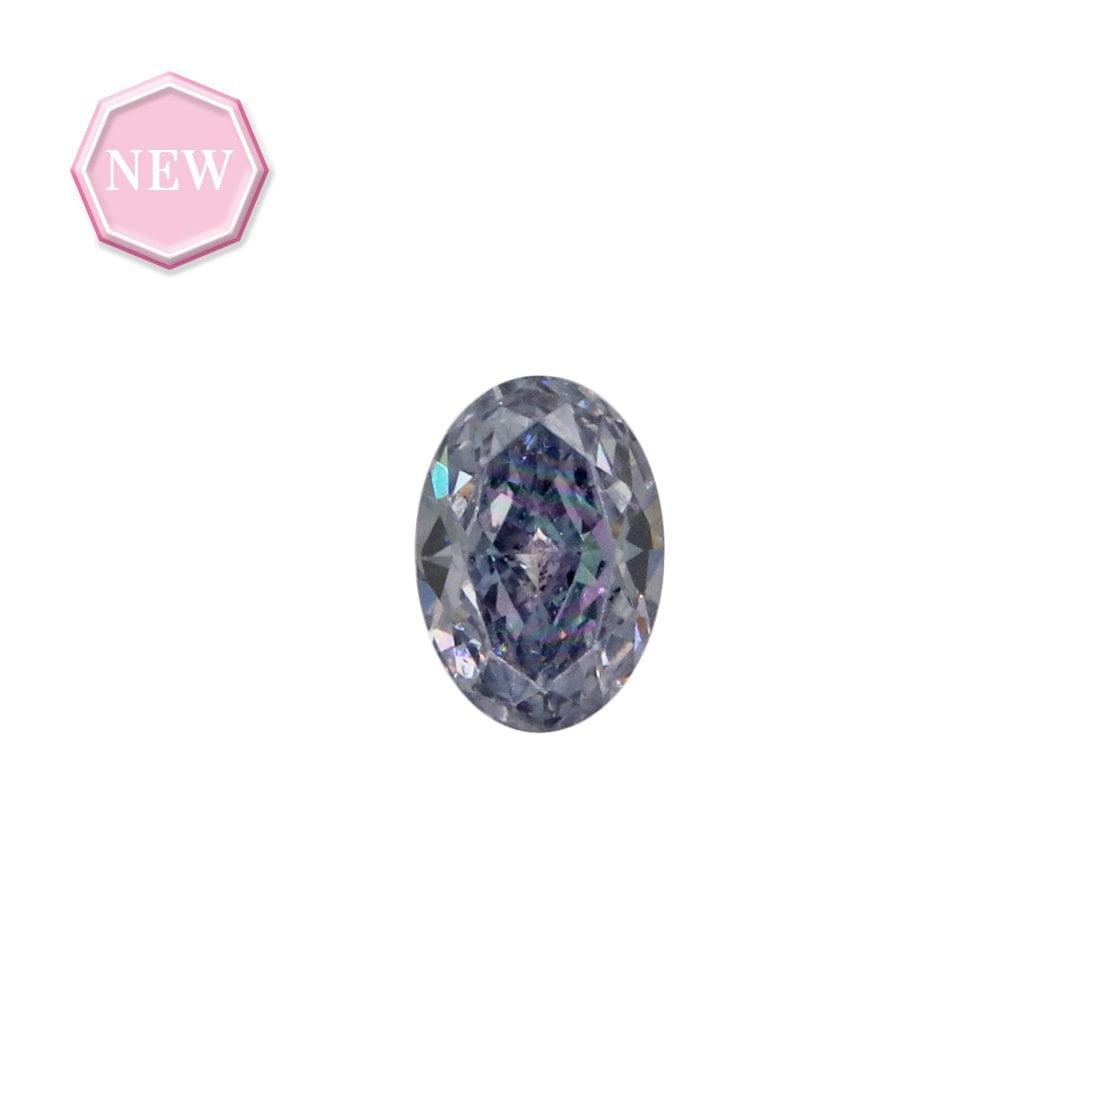 0.11ct Natural Fancy Intense Blue Grey VS2, BL2+ Argyle Diamond